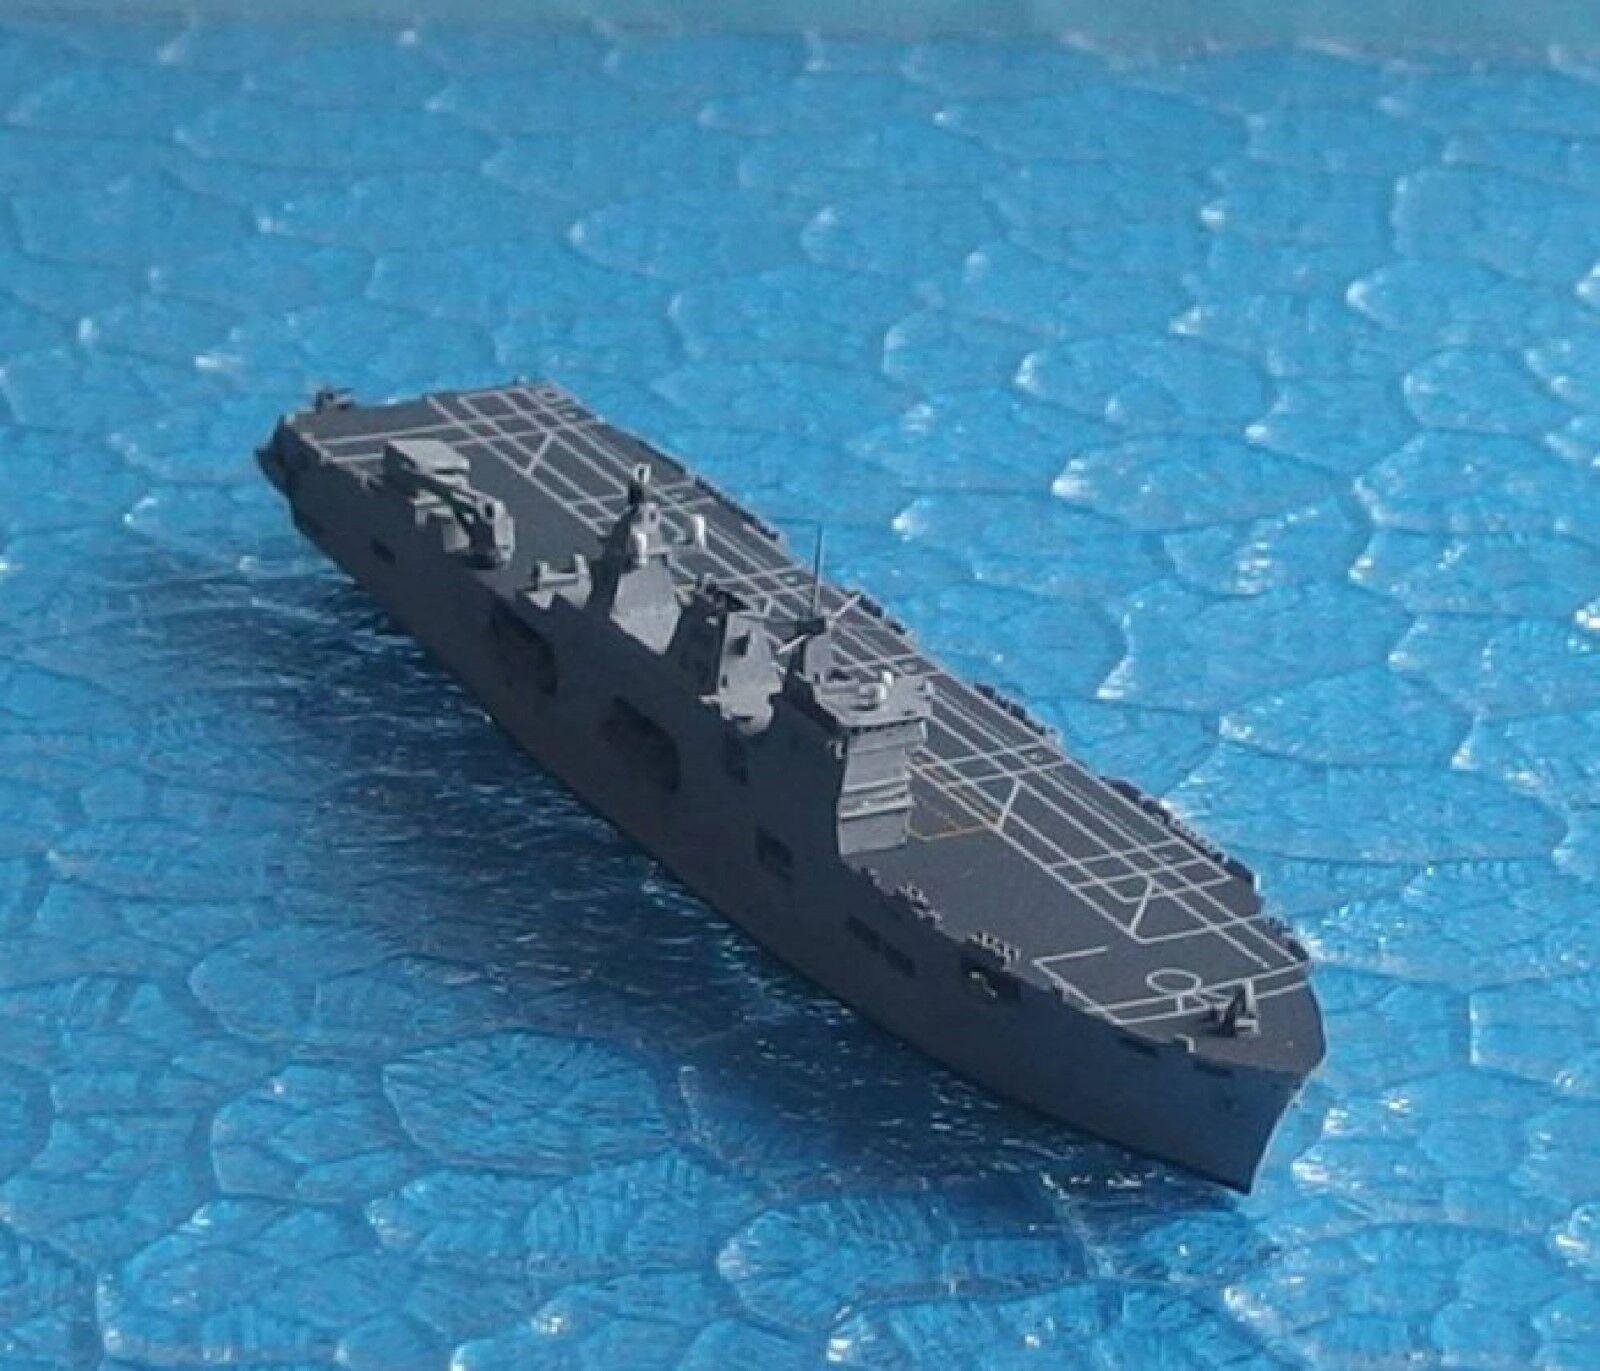 Albatros navire 1 1250 Go. porte-avions  Ocean  Al K 096 a Nouveauté